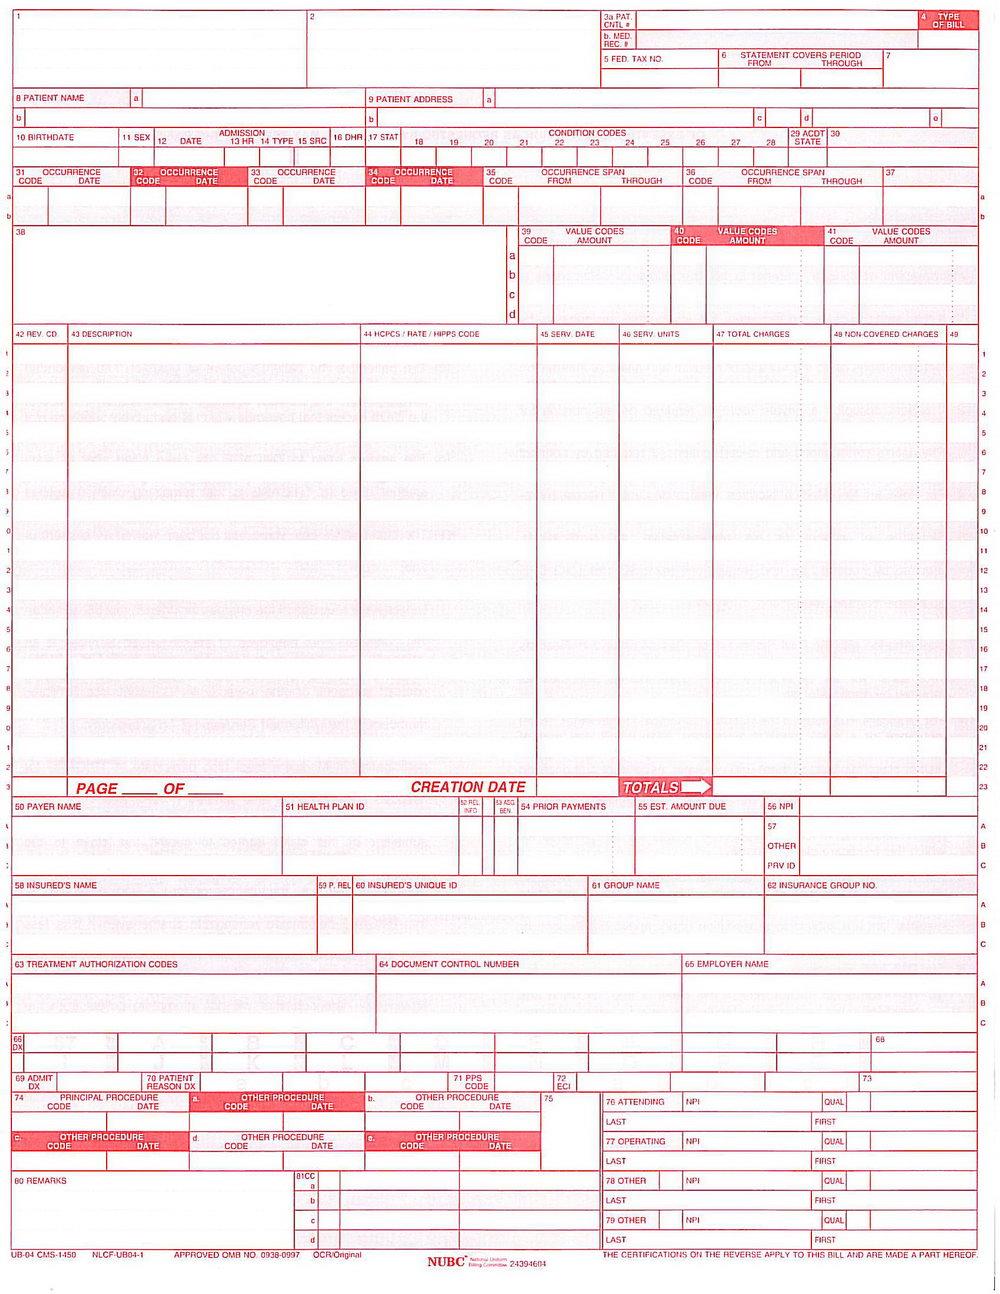 Ub 04 Forms